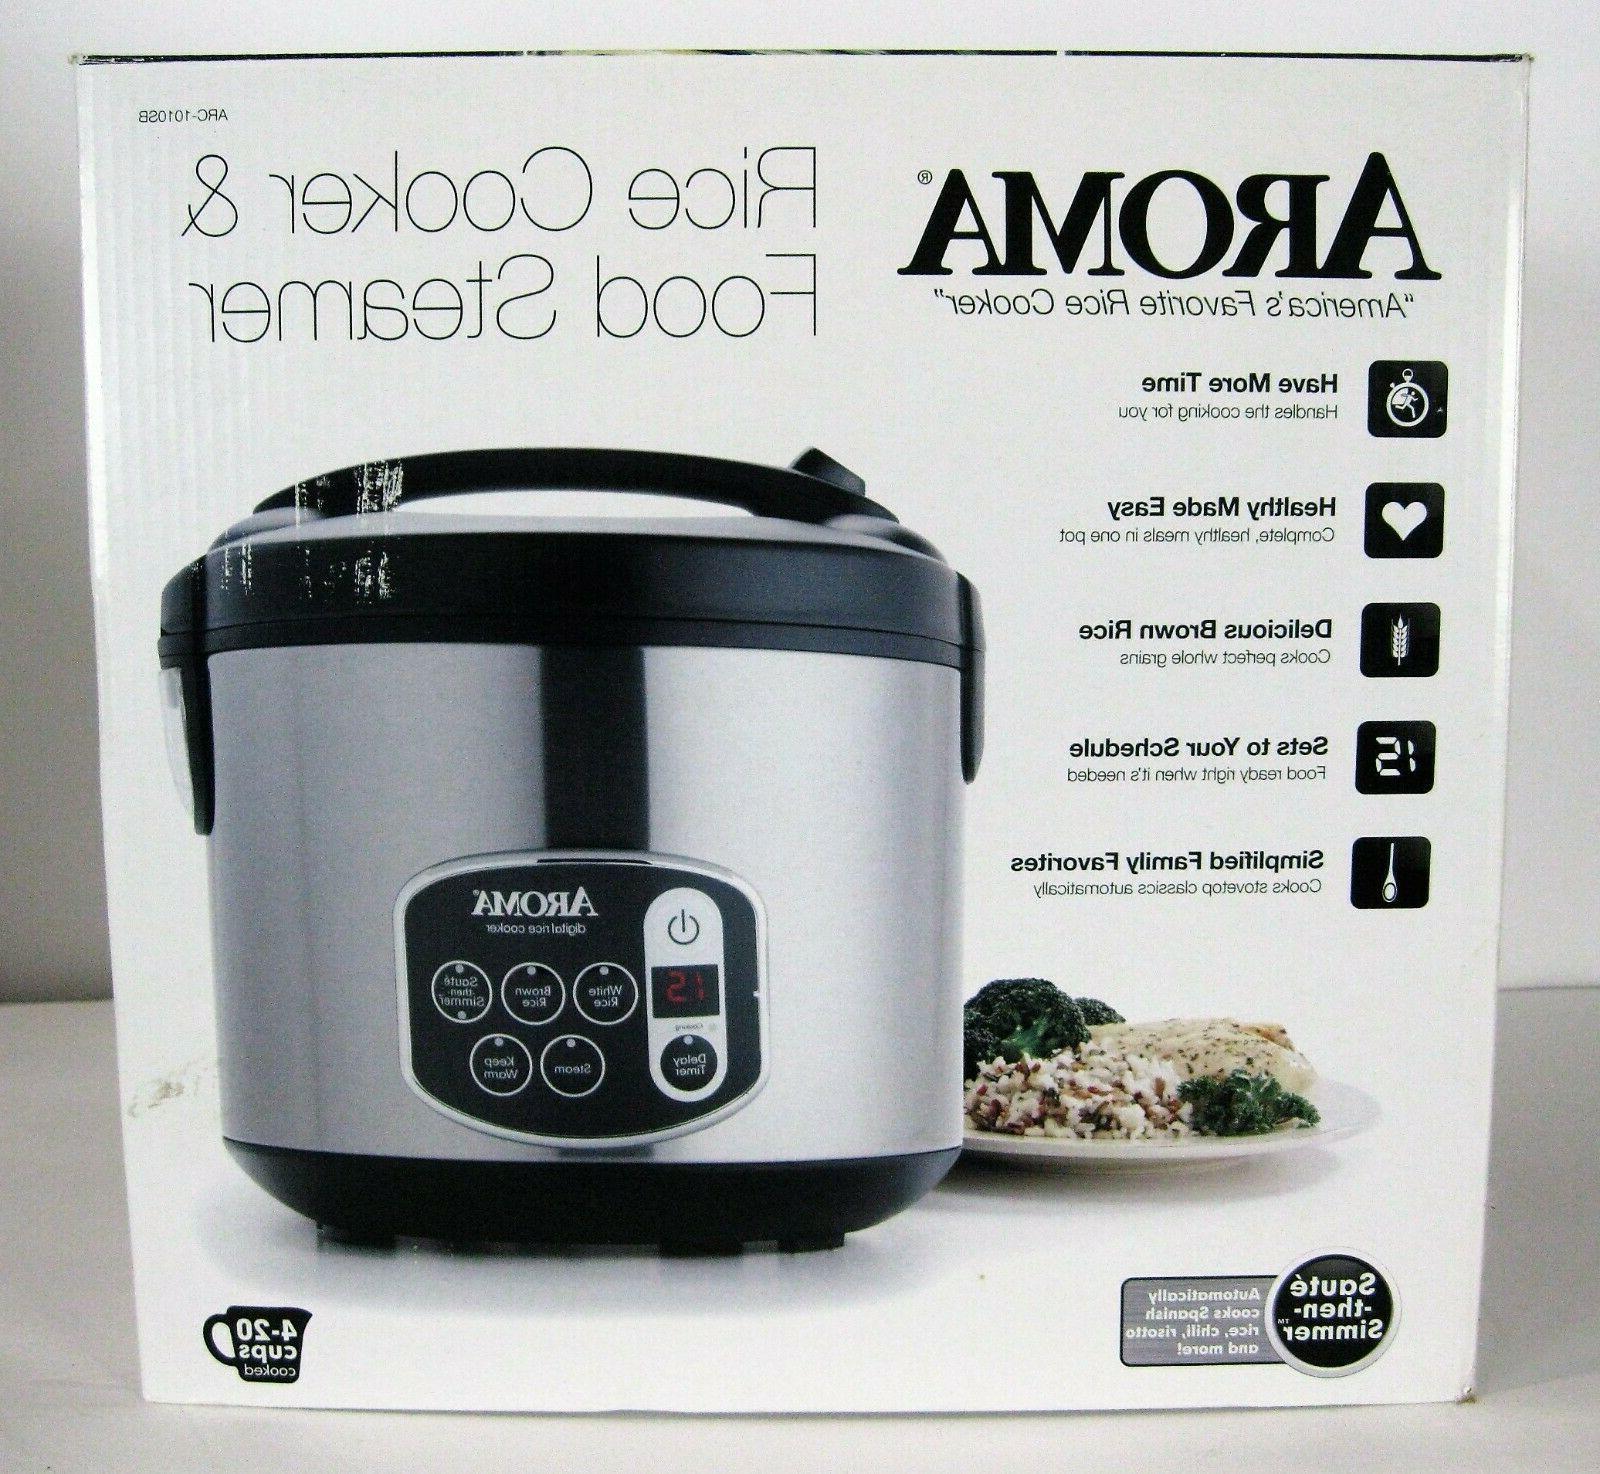 Aroma Housewares 20-Cup   Digital Rice Cooker & Food Steamer